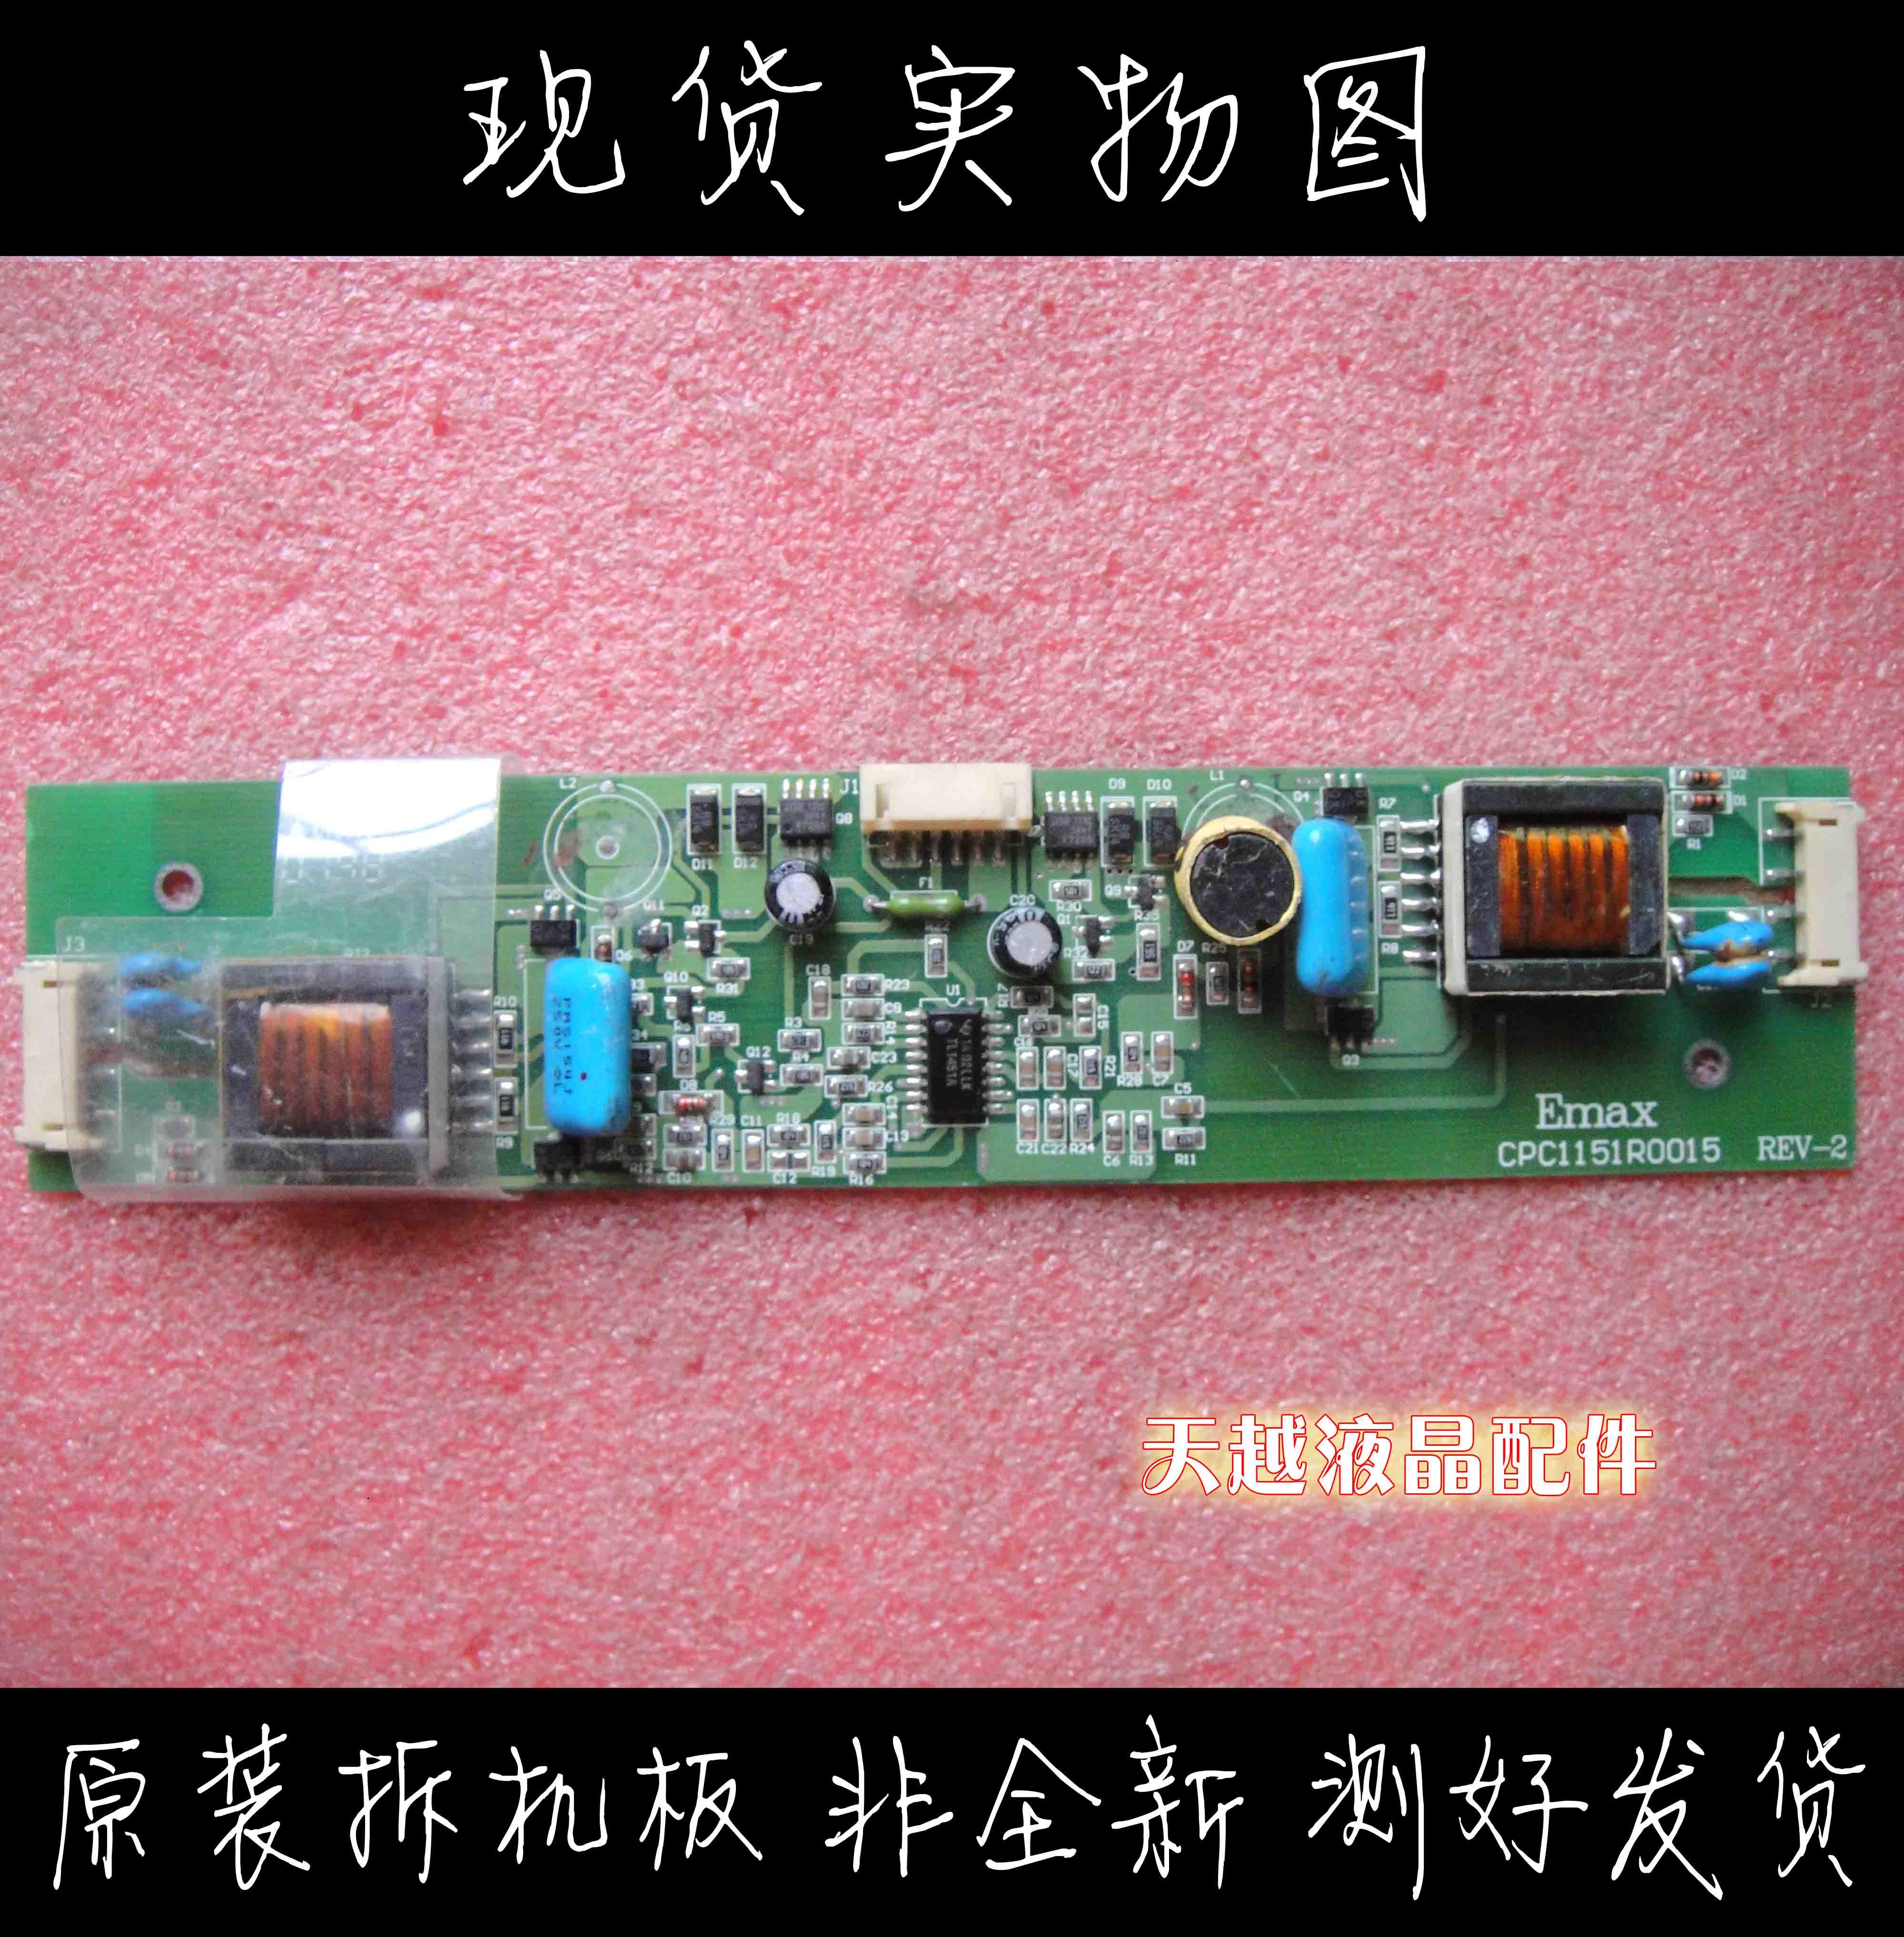 Display VE170b Emax Pressure Plate CPC1151R0015 Inverter CPC1151R6015